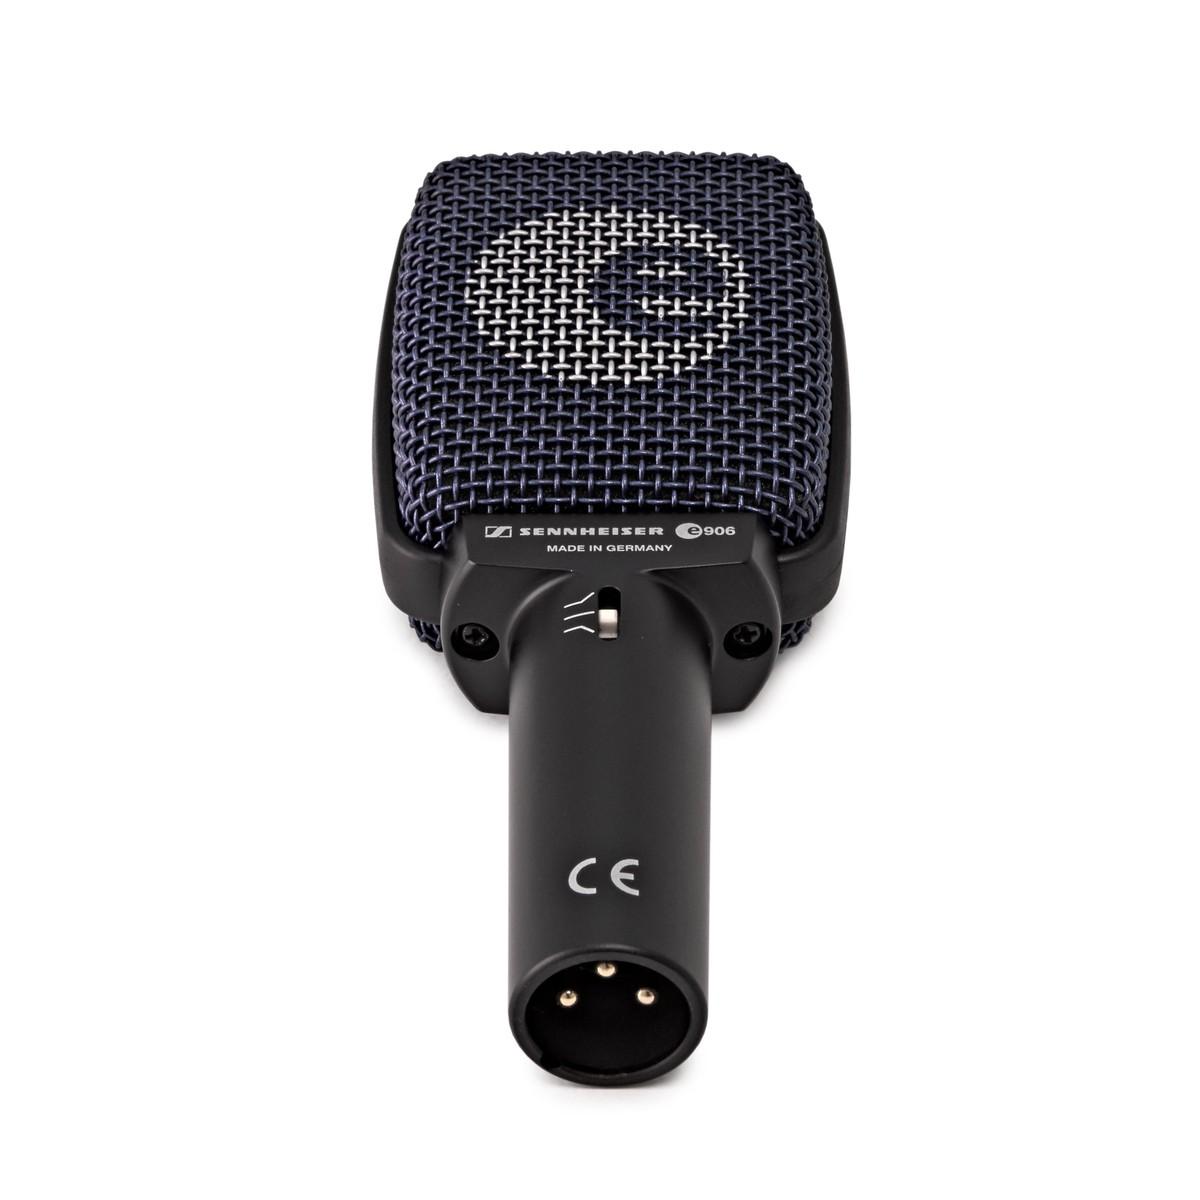 sennheiser e906 dynamic microphone for guitar cabinets at. Black Bedroom Furniture Sets. Home Design Ideas